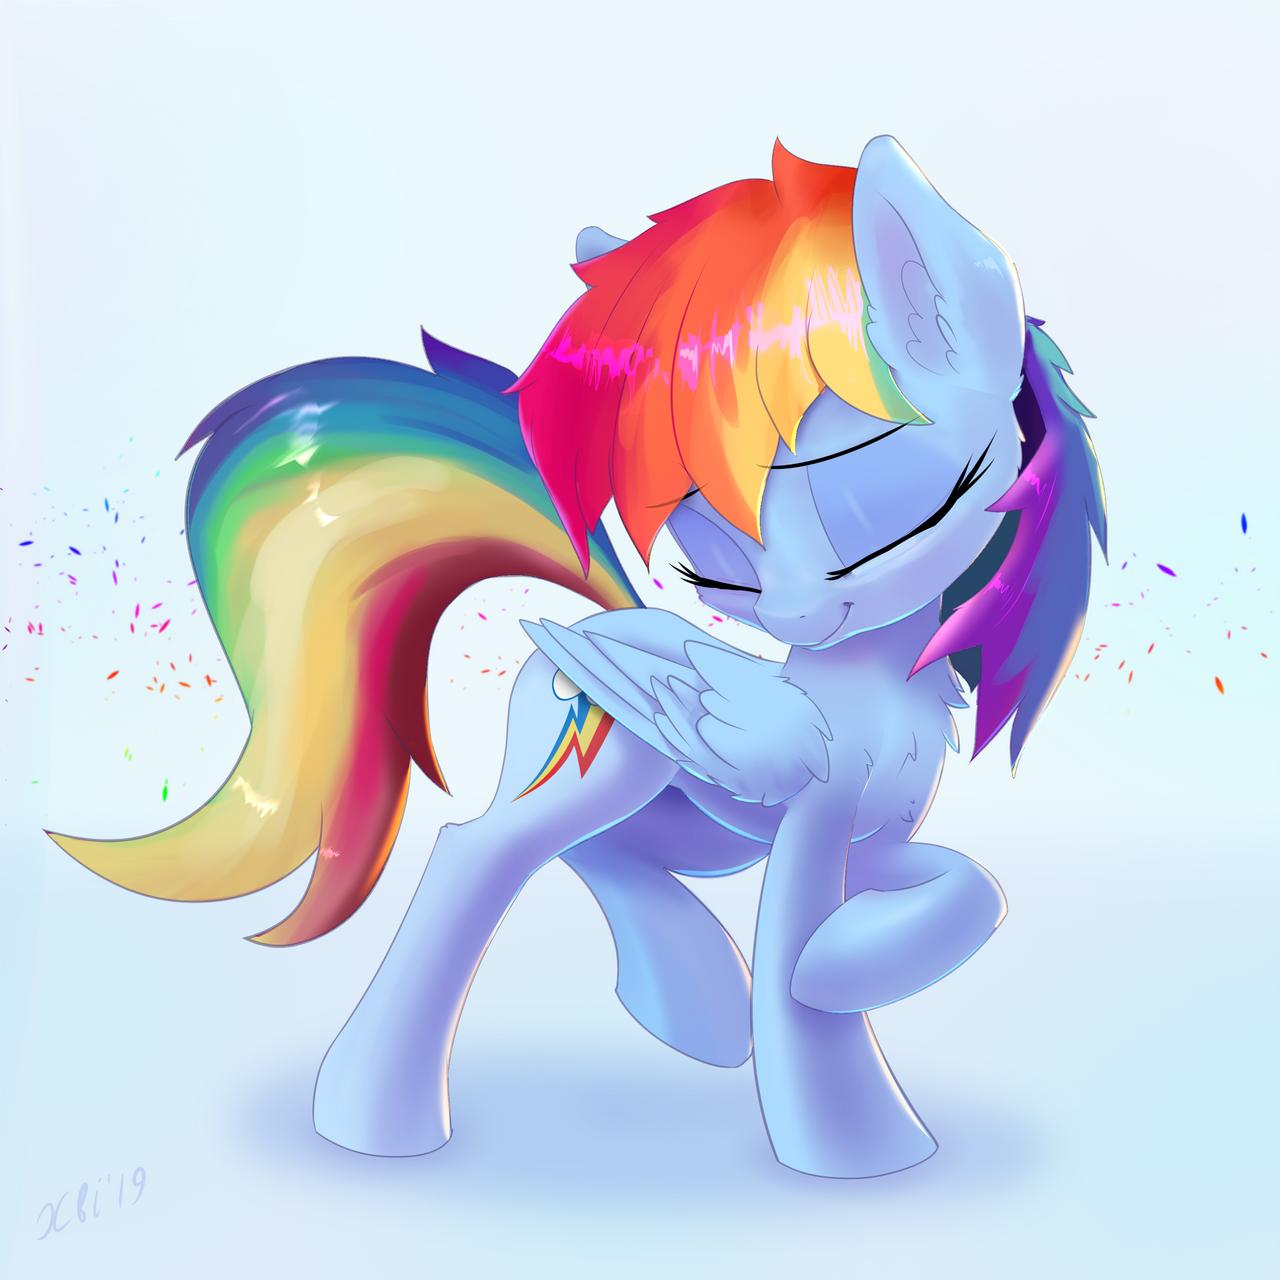 [Obrázek: rainbow_dash_looks_gorgeous_by_xbi_de1bg...Y1WteauPzE]